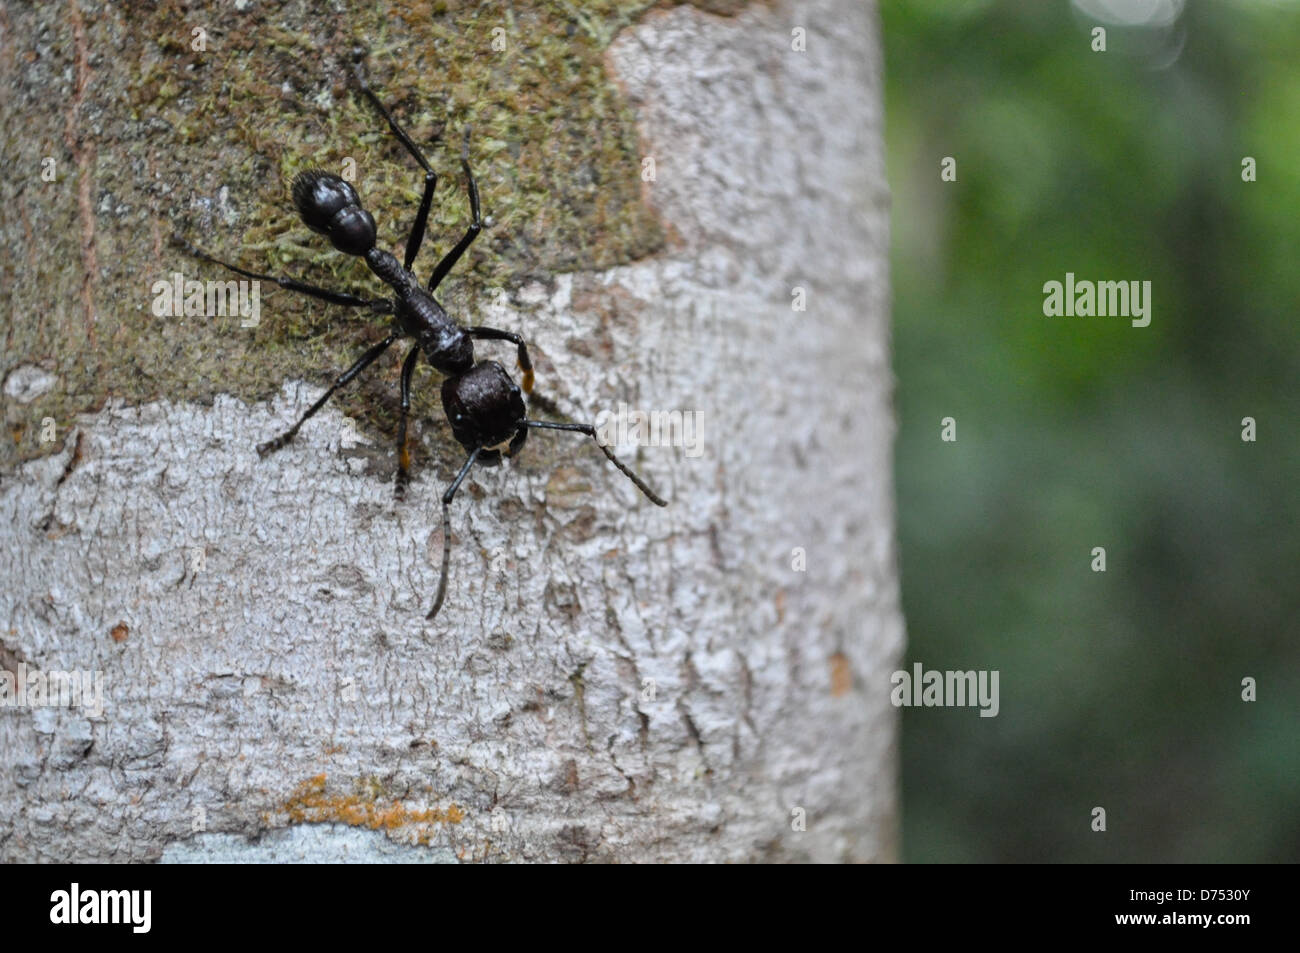 Hormiga Bala - bullet ant - Paraponera clavata Stock Photo